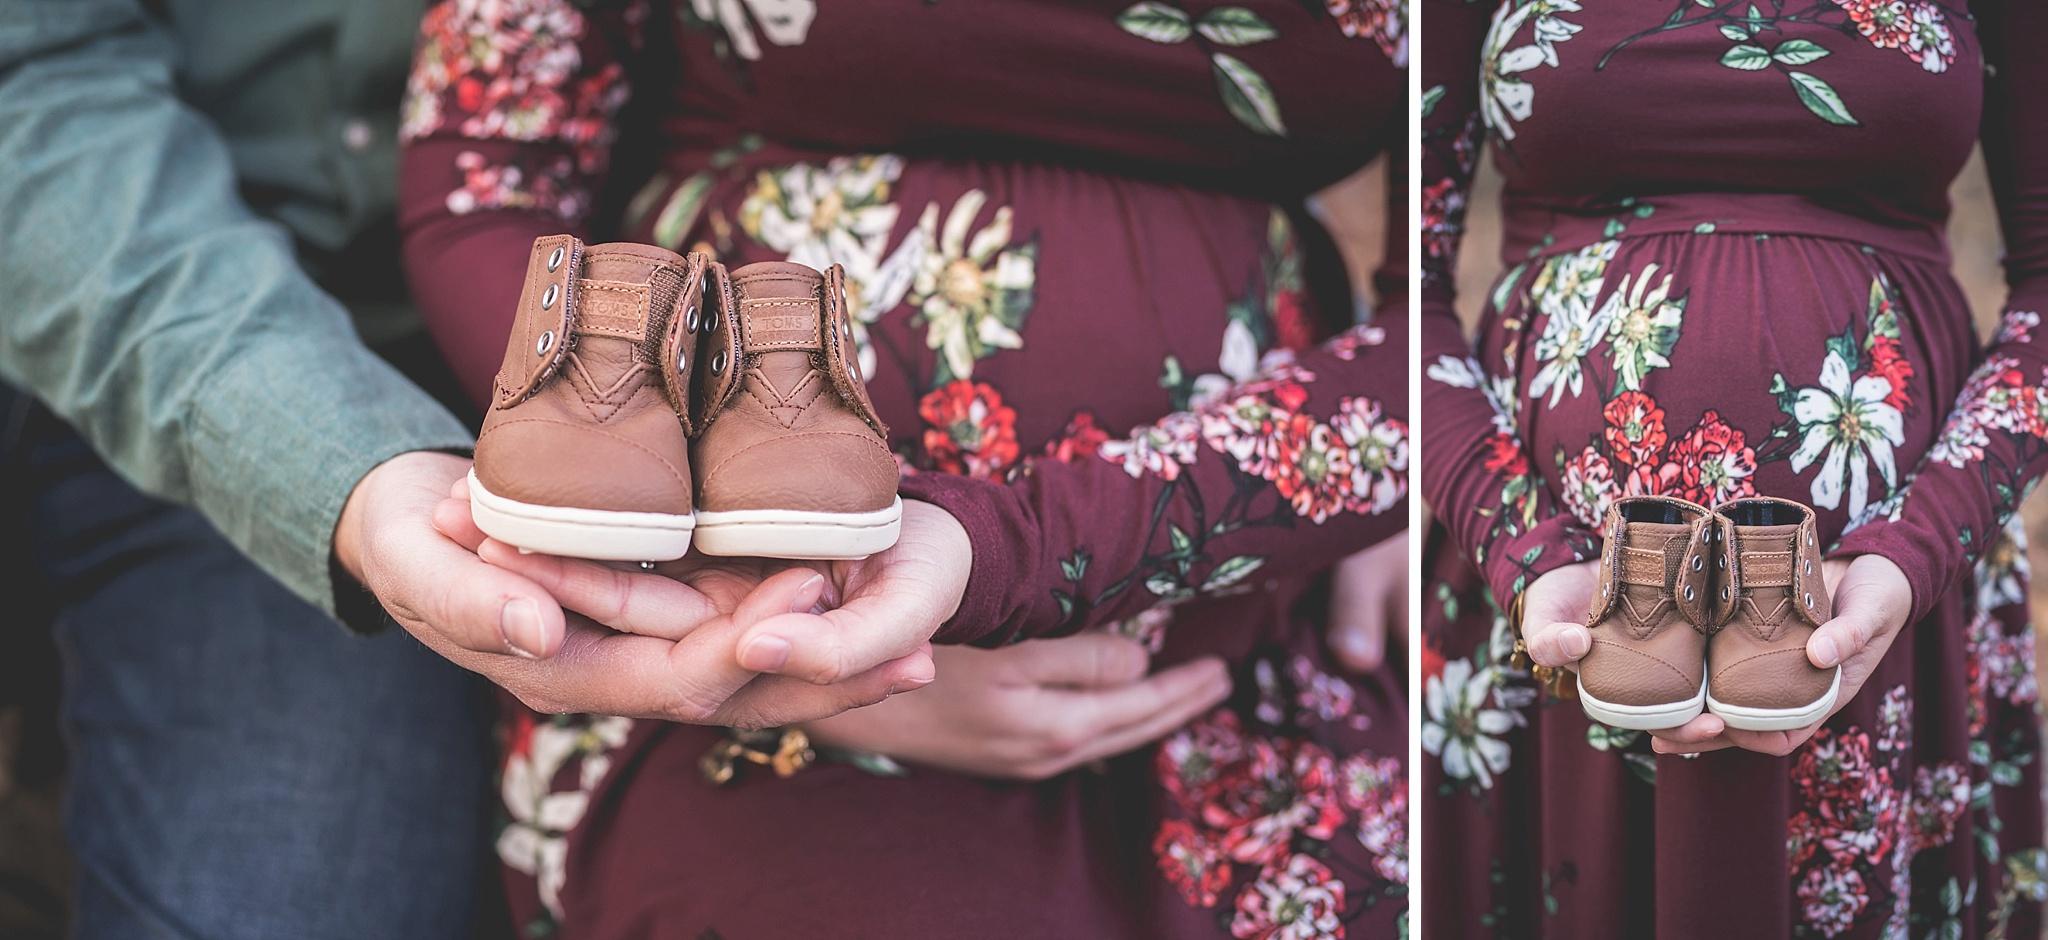 Greenville-NC-Maternity-Photographer-042.jpg